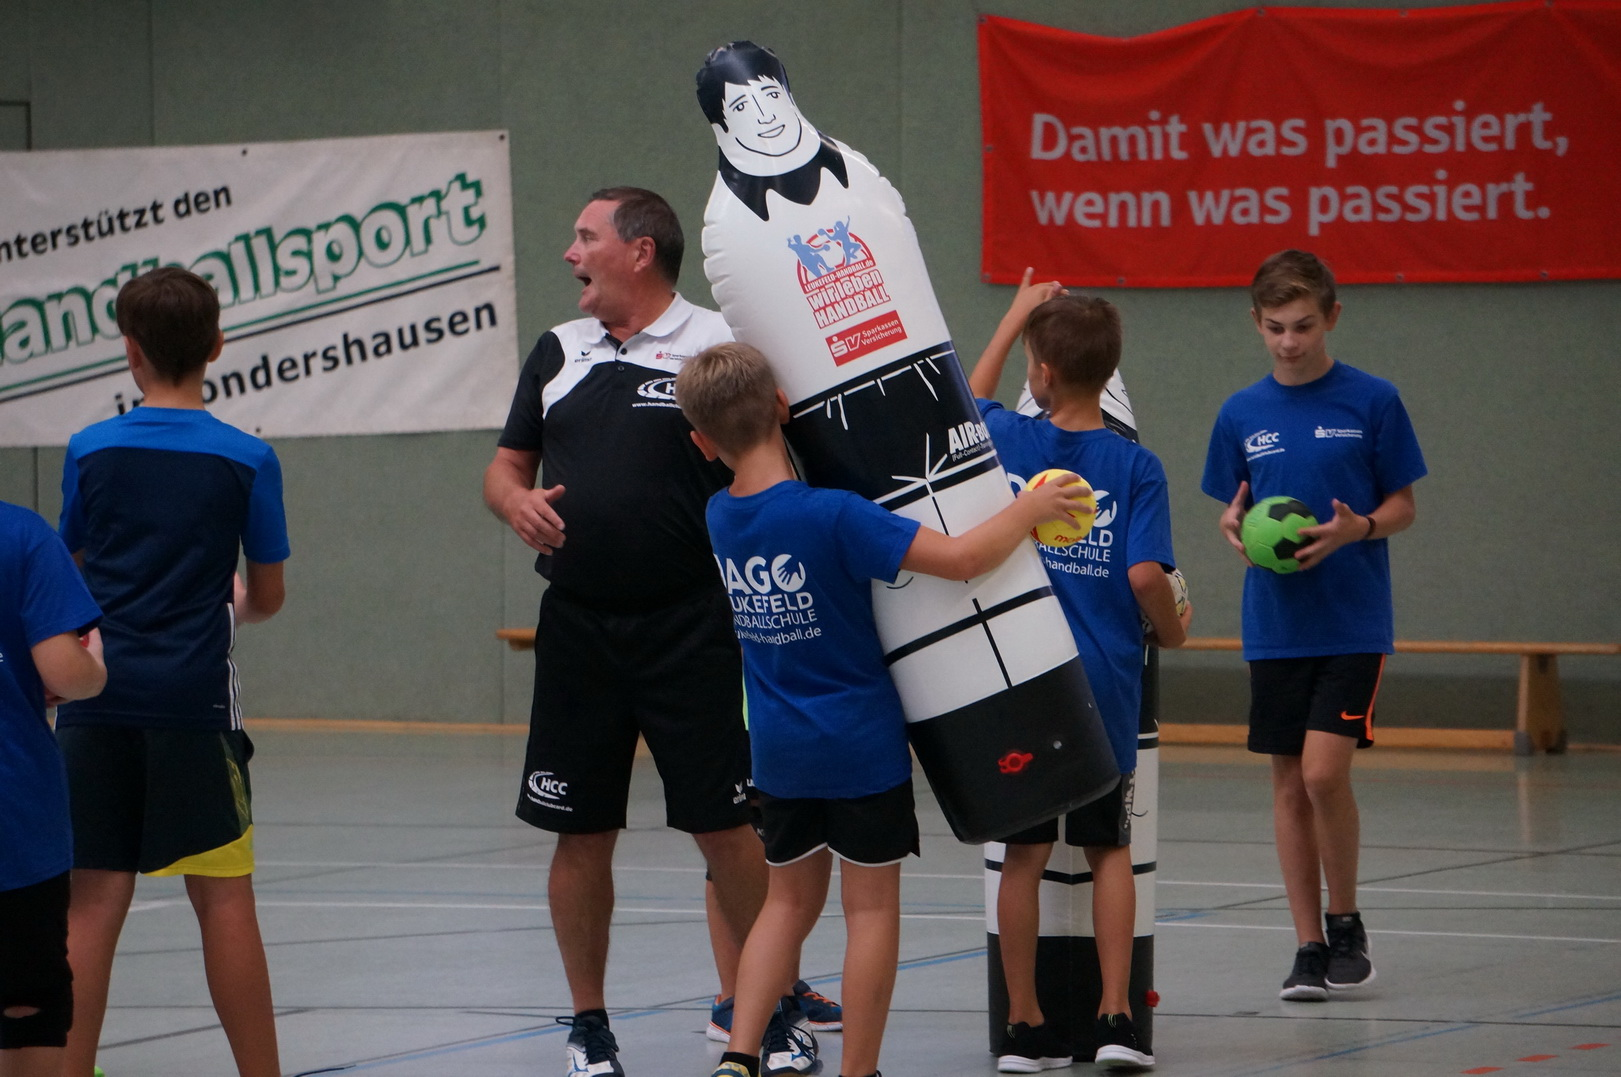 201808_Handballcamp_SDH_MG_192w